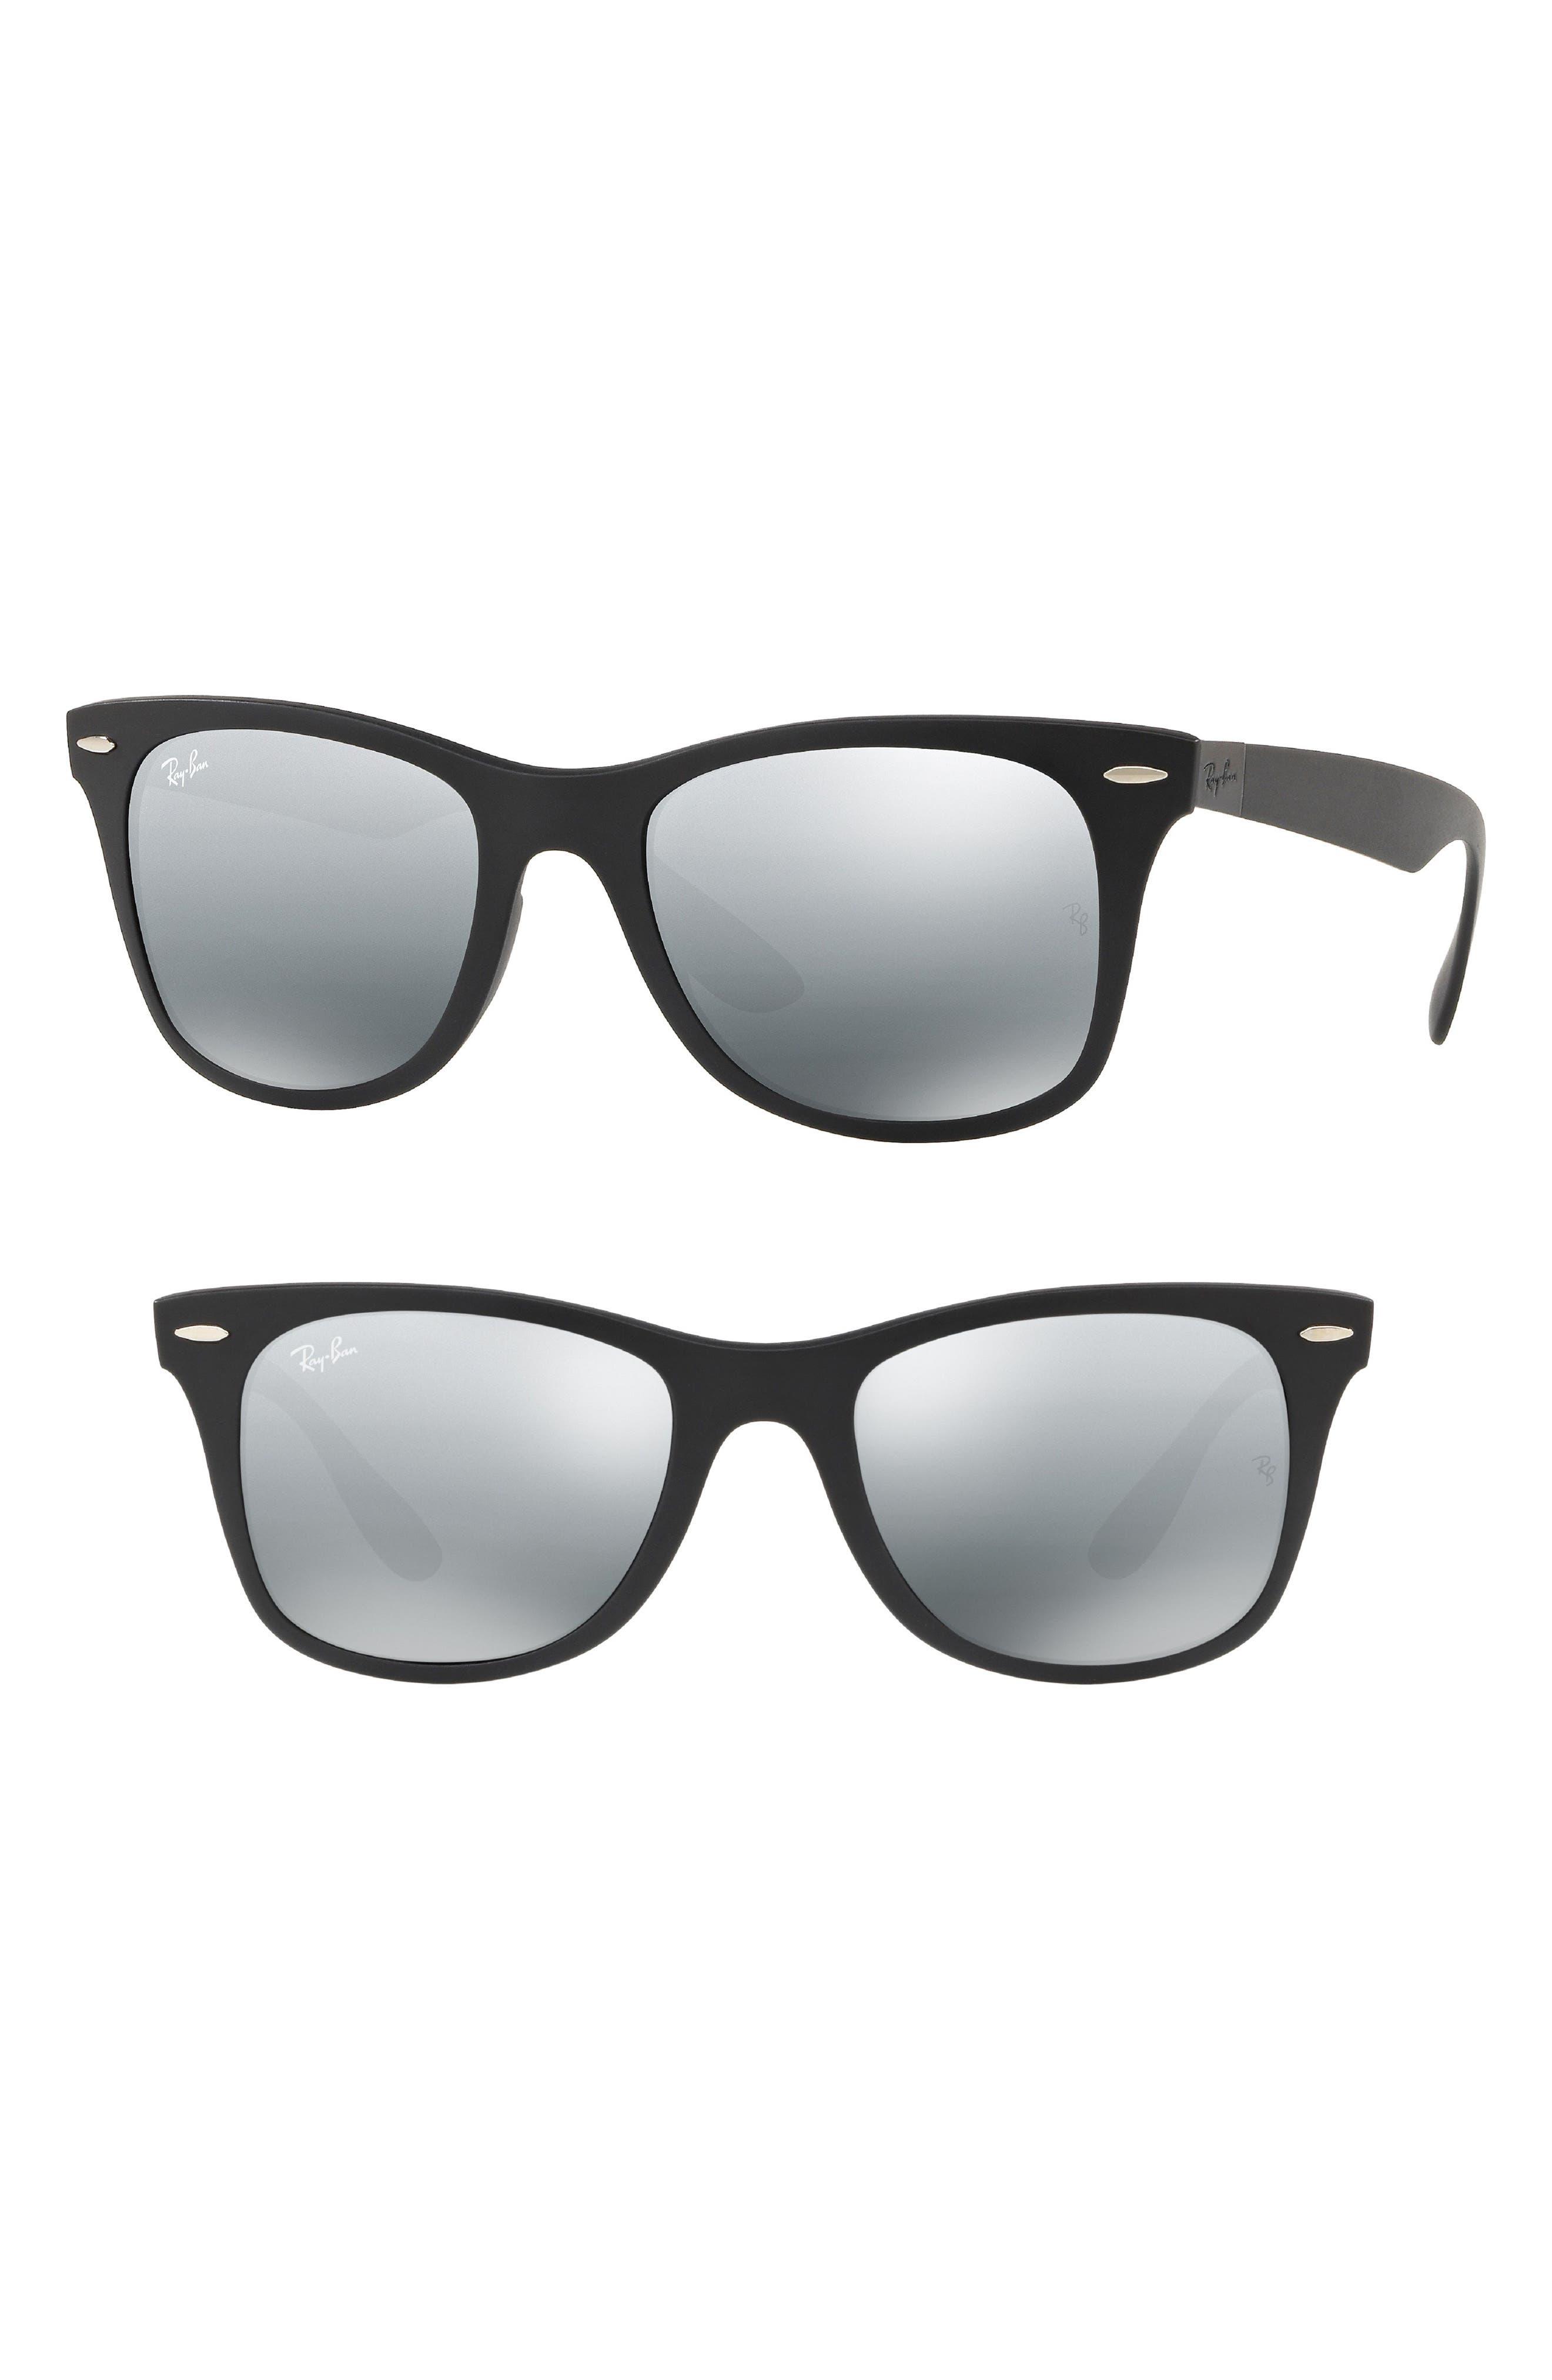 Tech Wayfarer Liteforce 52mm Sunglasses,                         Main,                         color, Matte Black